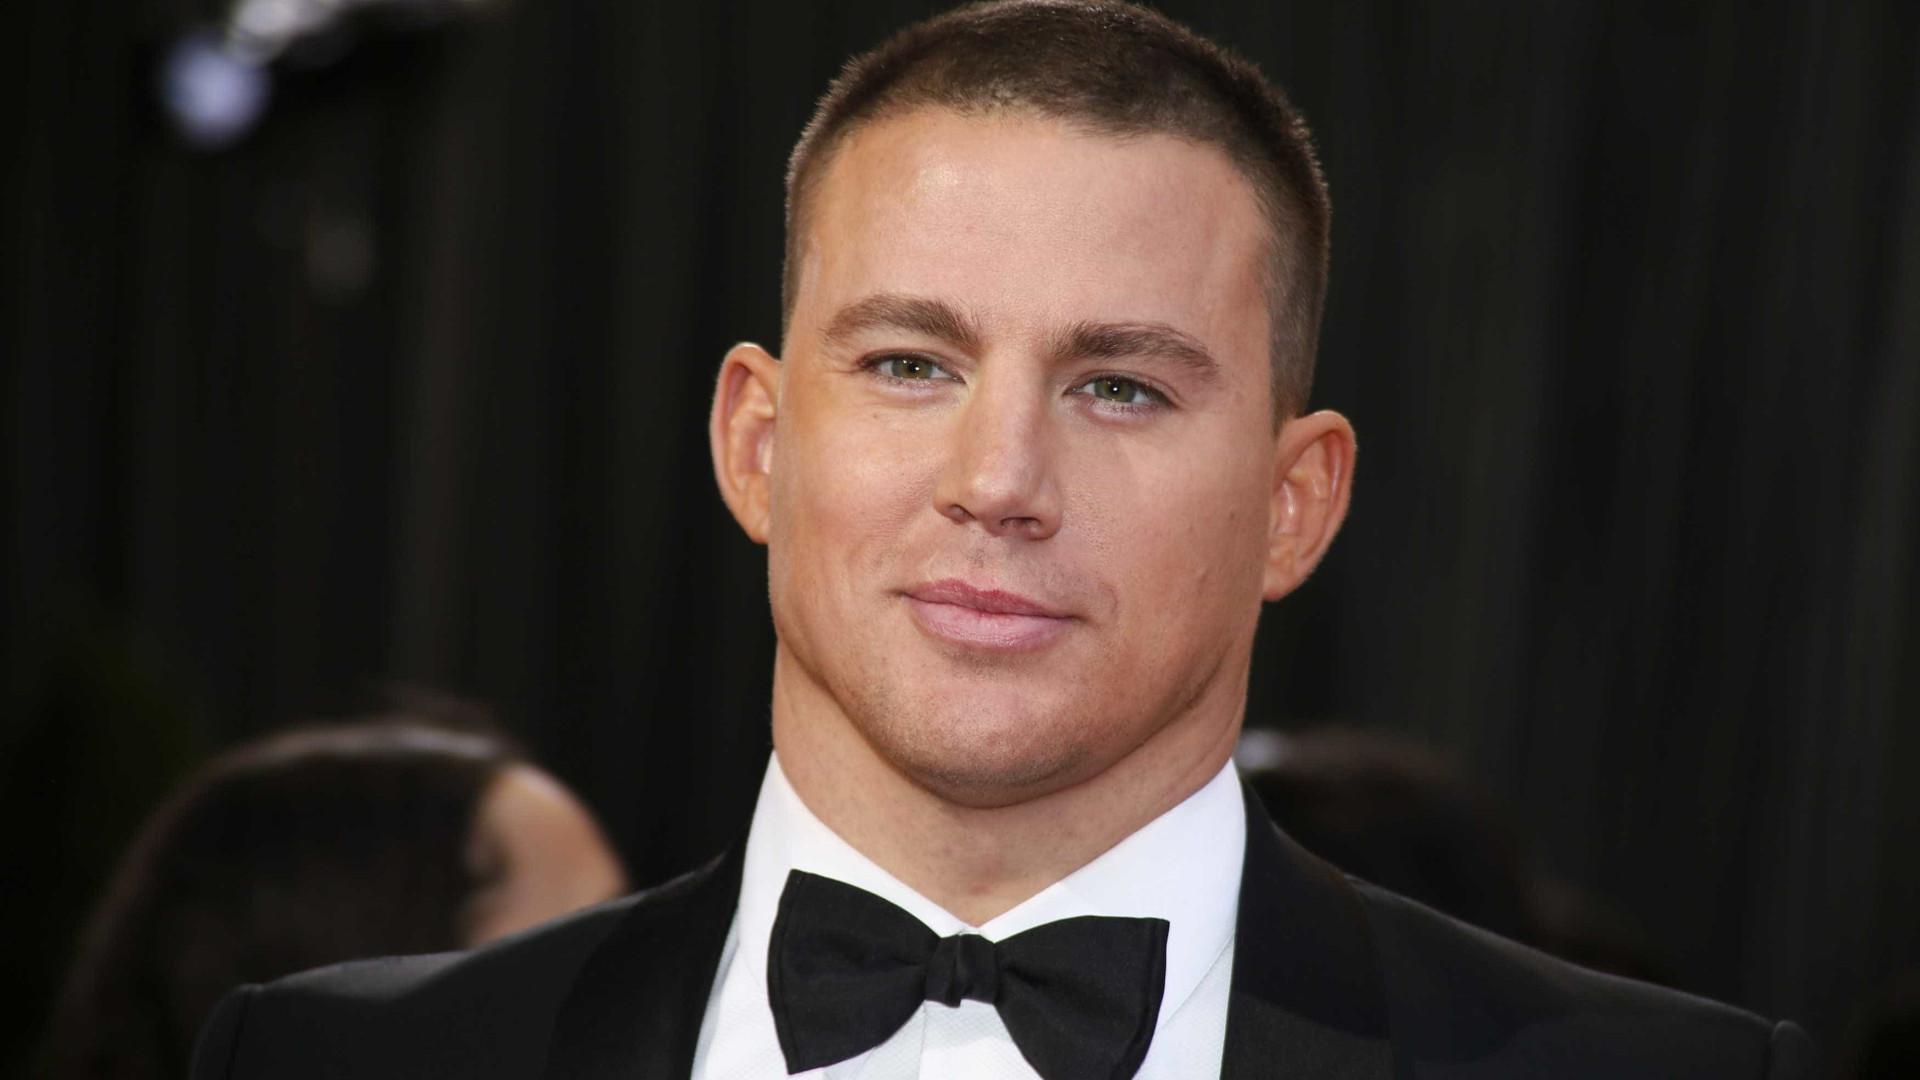 Channing Tatum termina parceria com a The Weinstein Company